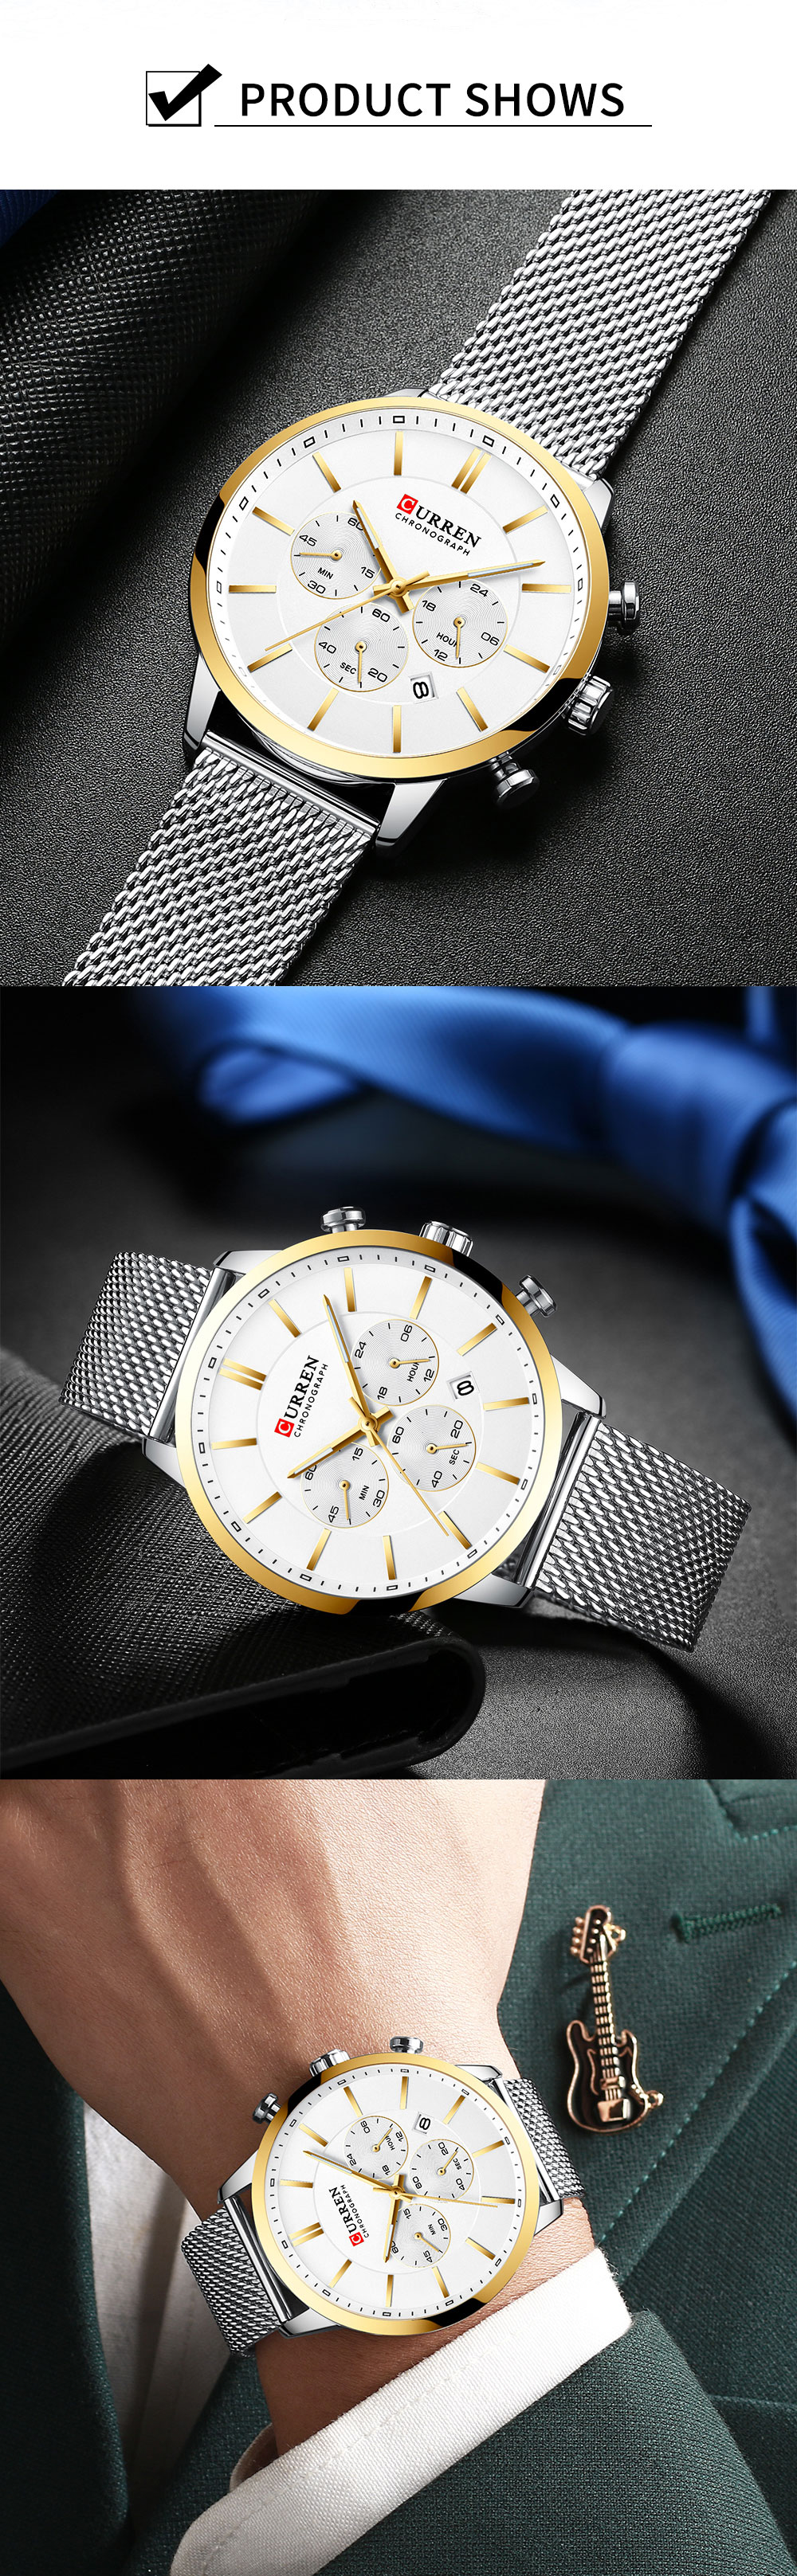 CURREN Watch Men Fashion Business Watches Men's Casual Waterproof Quartz Wristwatch Blue Steel Clock Relogio Masculino